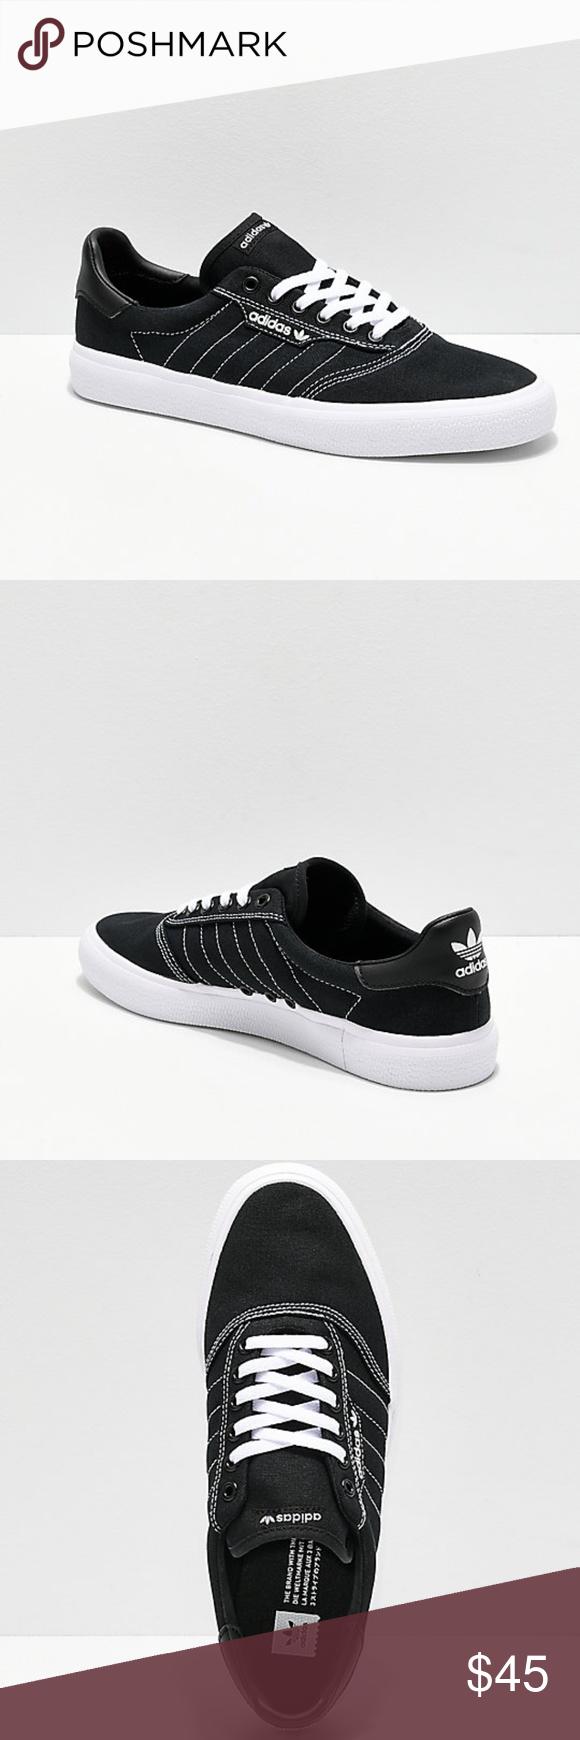 Mens adidas 3MC Black \u0026 White Contrast